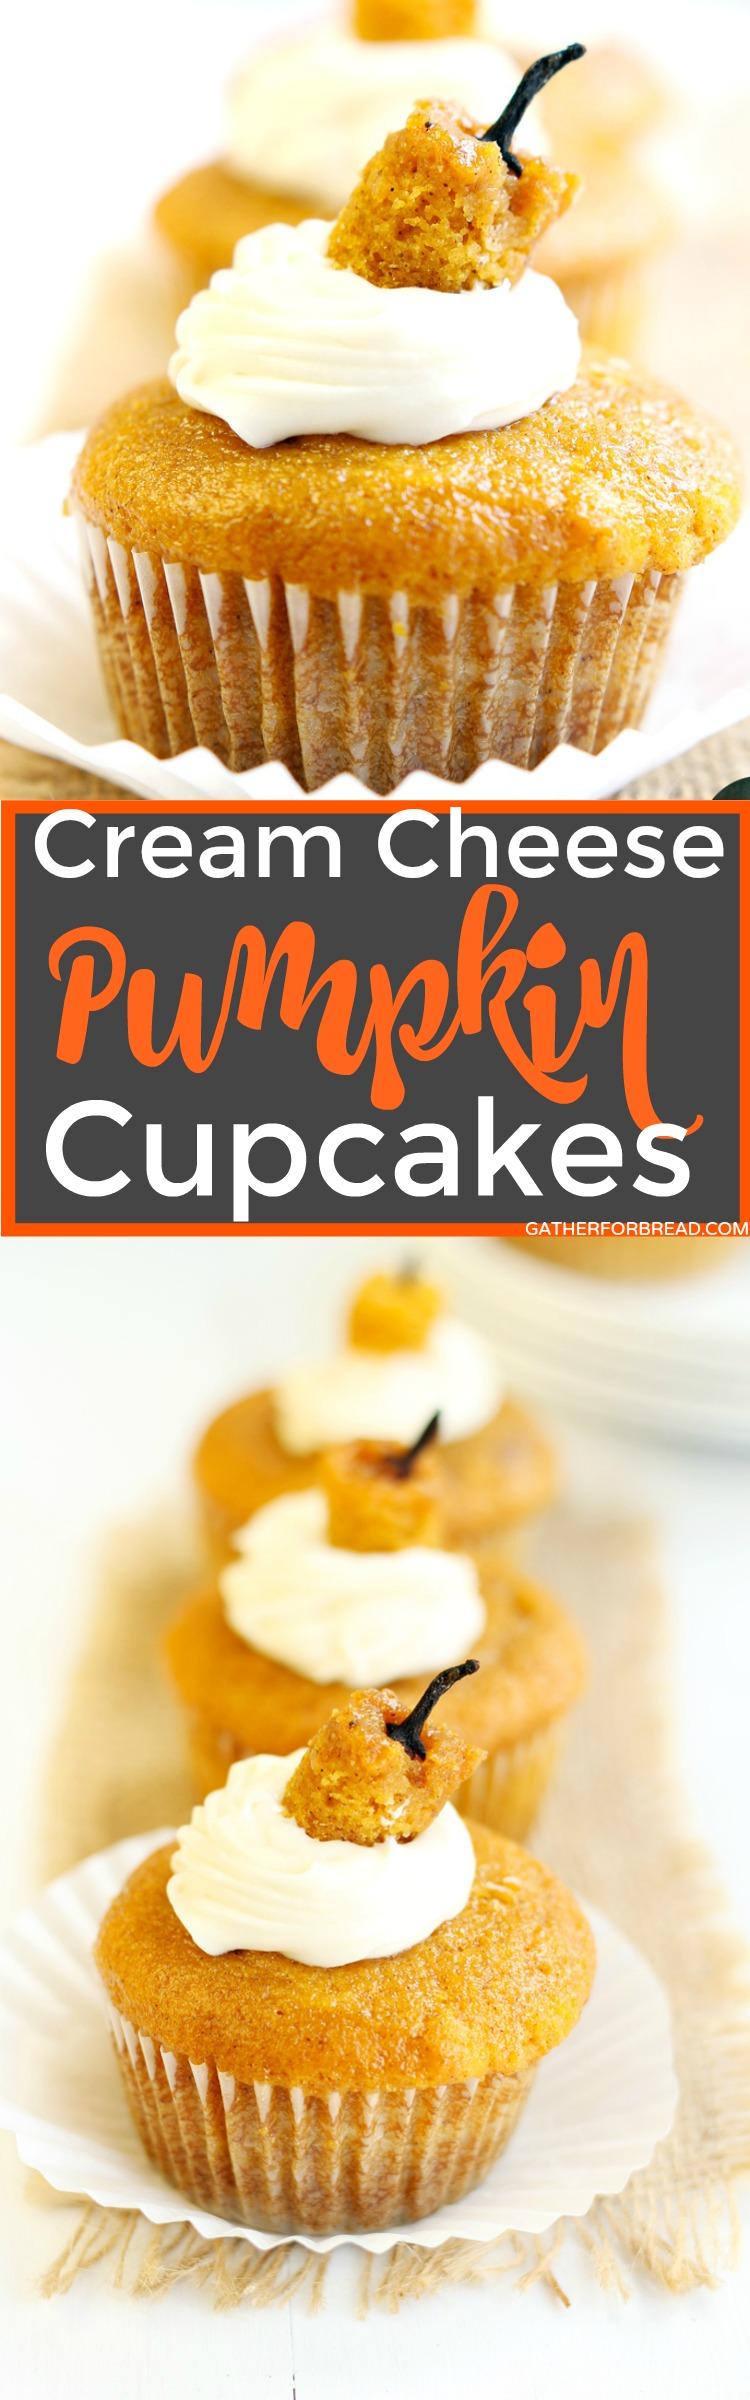 Cream Cheese Pumpkin Cupcakes - Moist homemade pumpkin cupcakes filled with an easy cream cheese frosting. These amazing pumpkin cupcakes are a perfect fall treat!